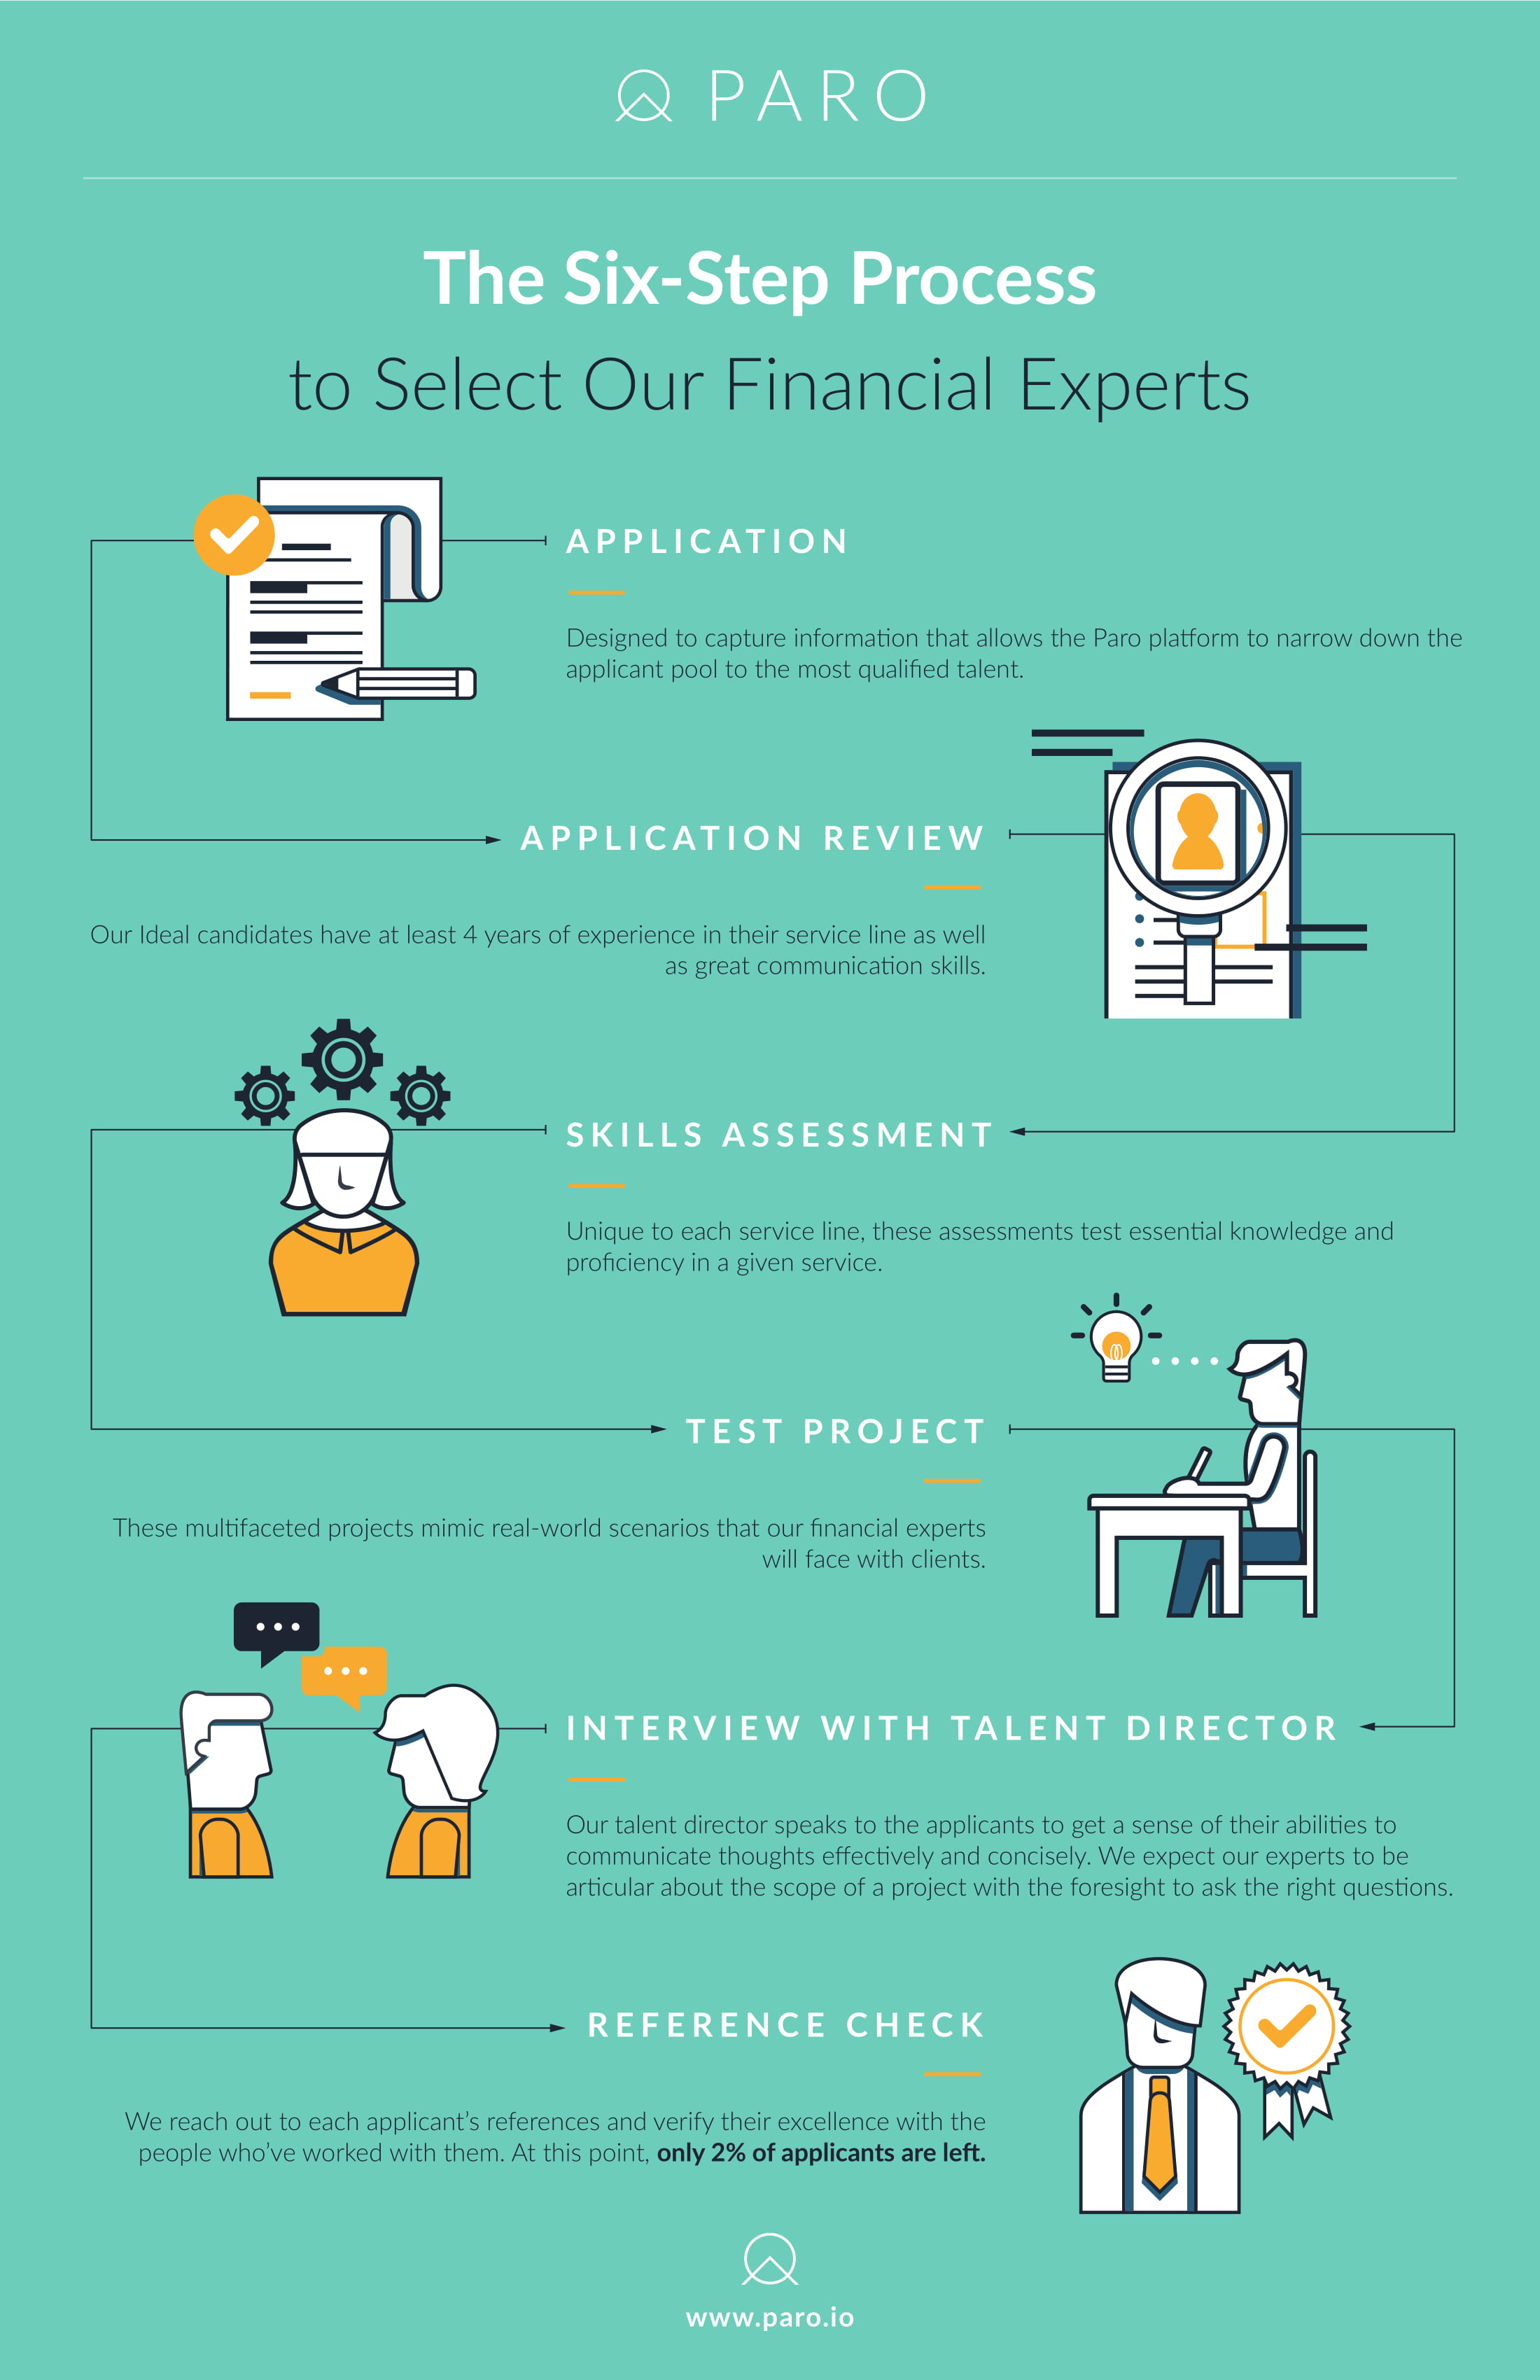 Paro-Infographic-Vetting-Process_v2-1